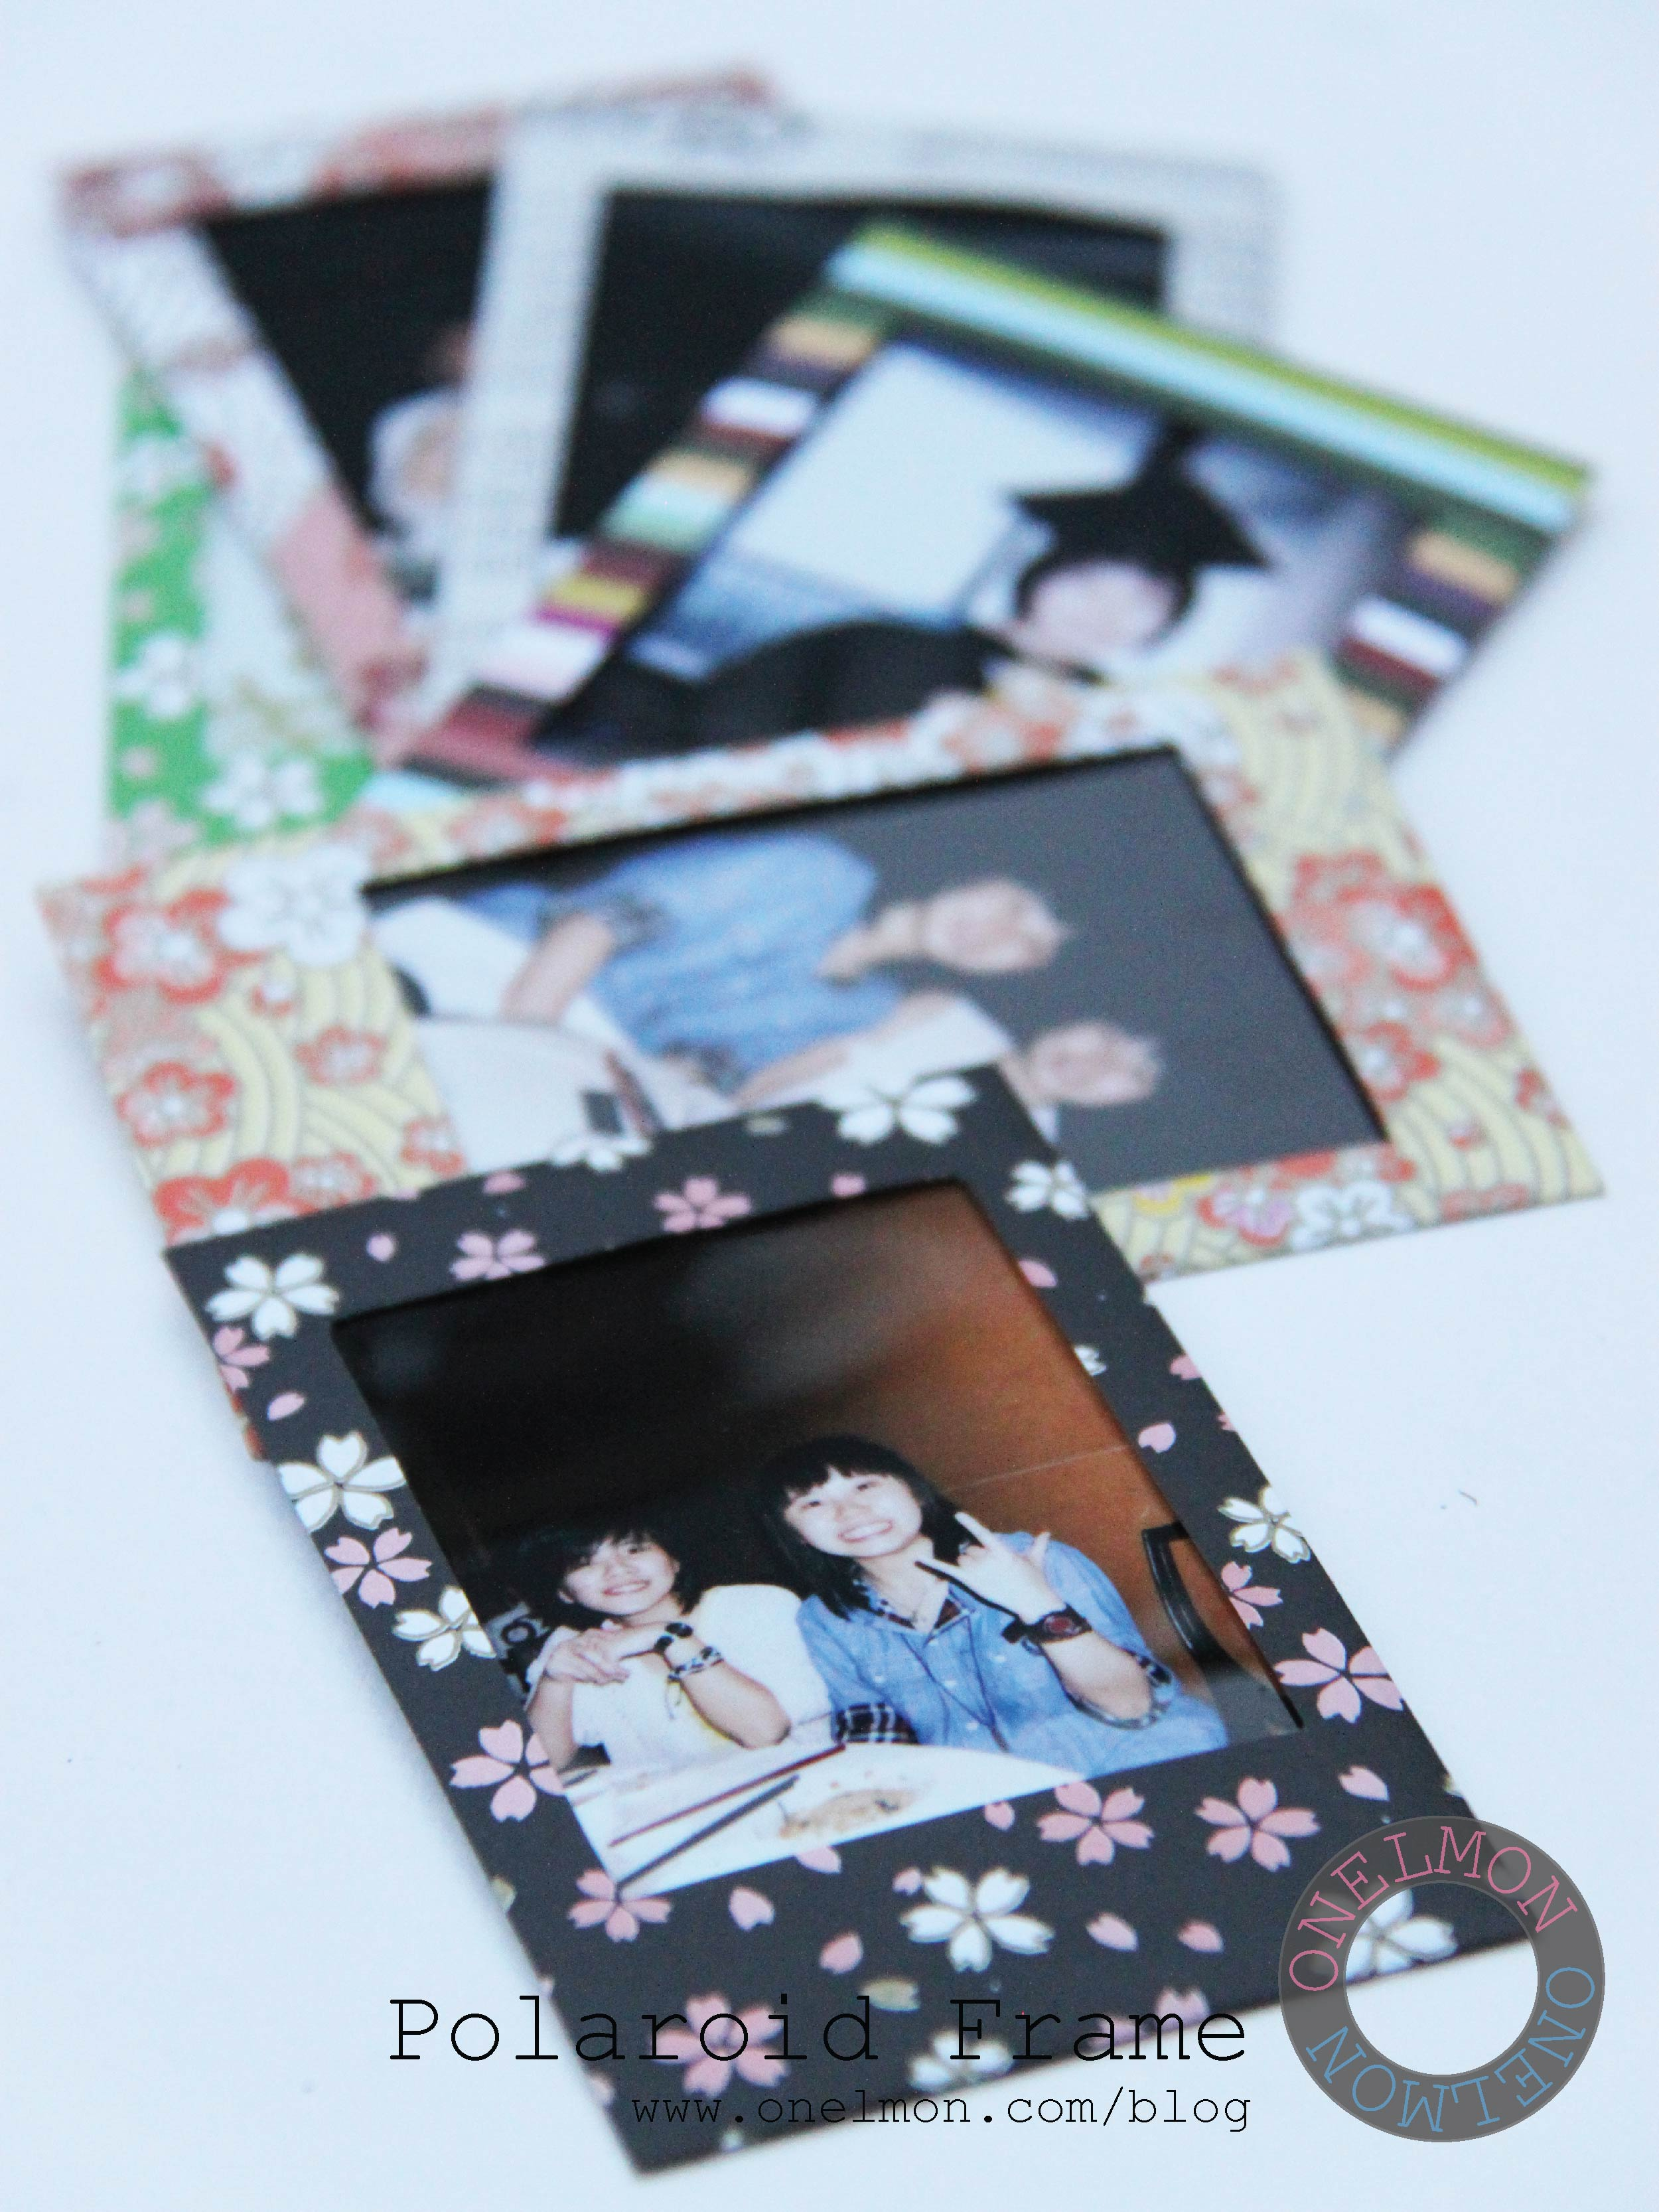 Cara Membuat Bingkai Poto : membuat, bingkai, Polaroid, Frame, Onelmon